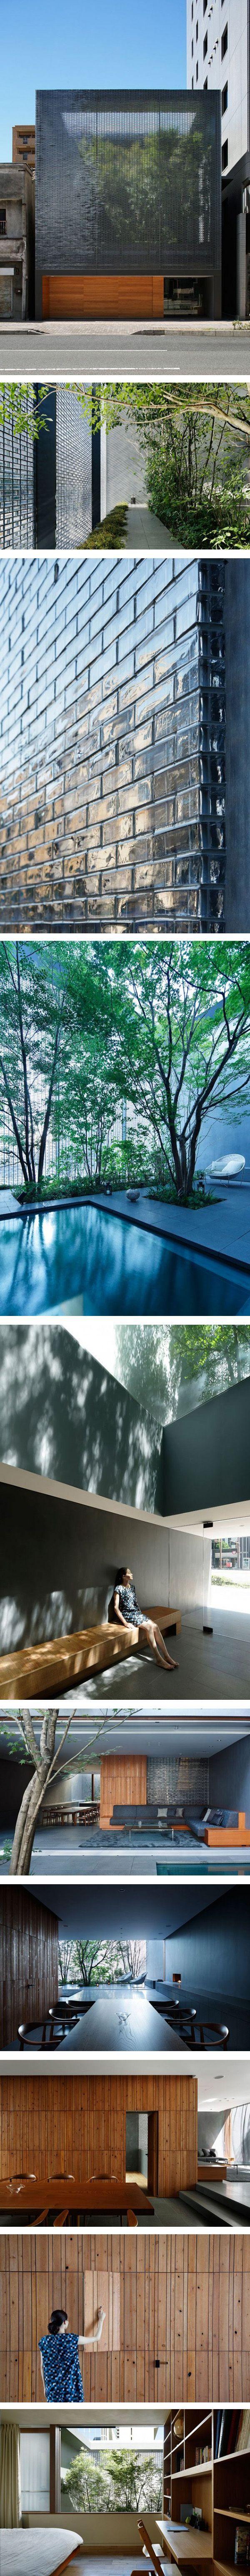 Glasshouse in Hiroshima, Japan. By Hiroshi Nakamura & NAP architects. Fotos by Nacasa & Partners #Architectural Solar